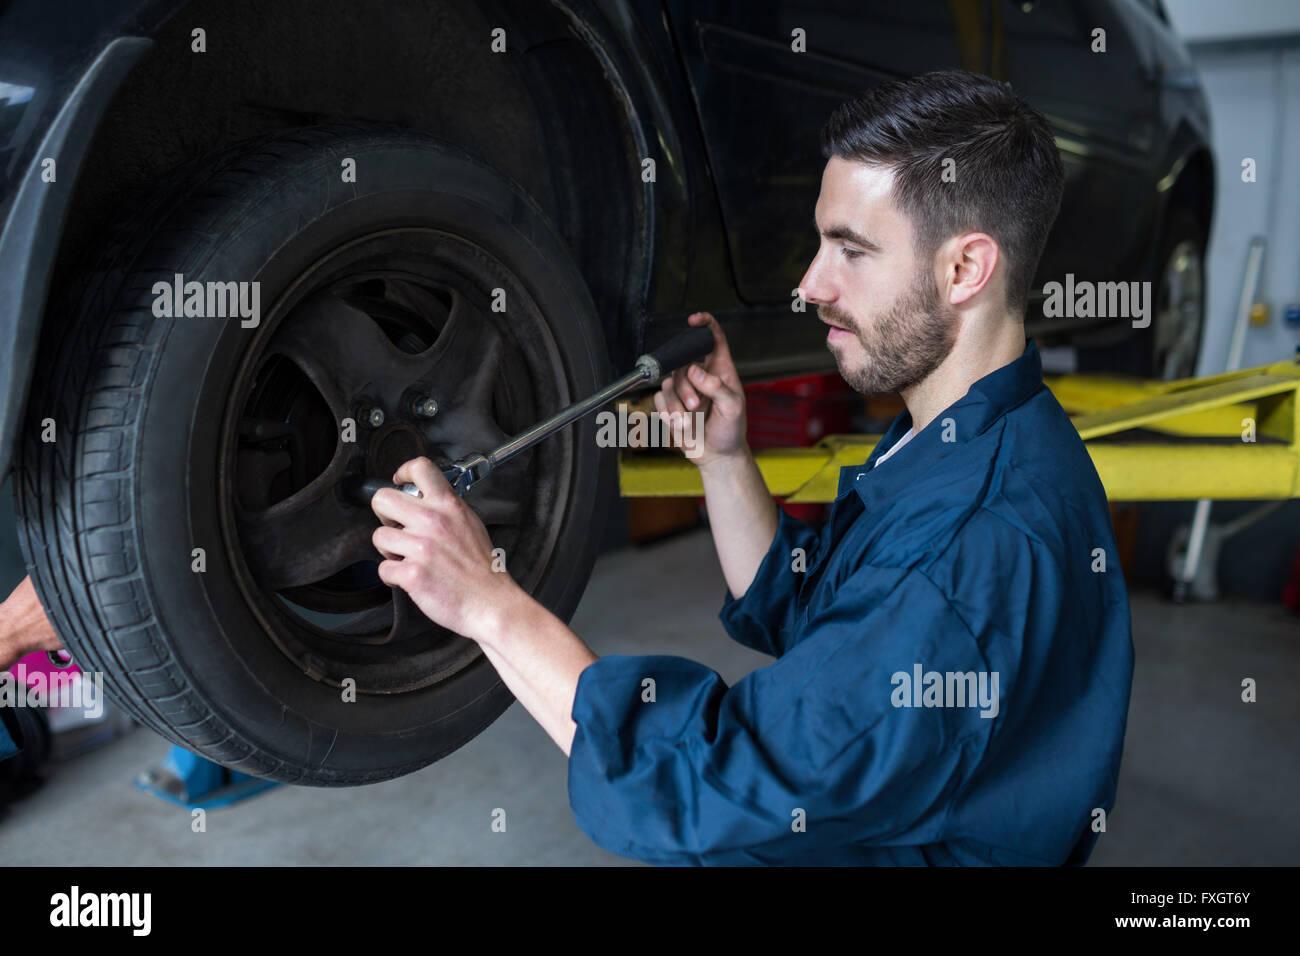 Mechanic changing car wheel - Stock Image